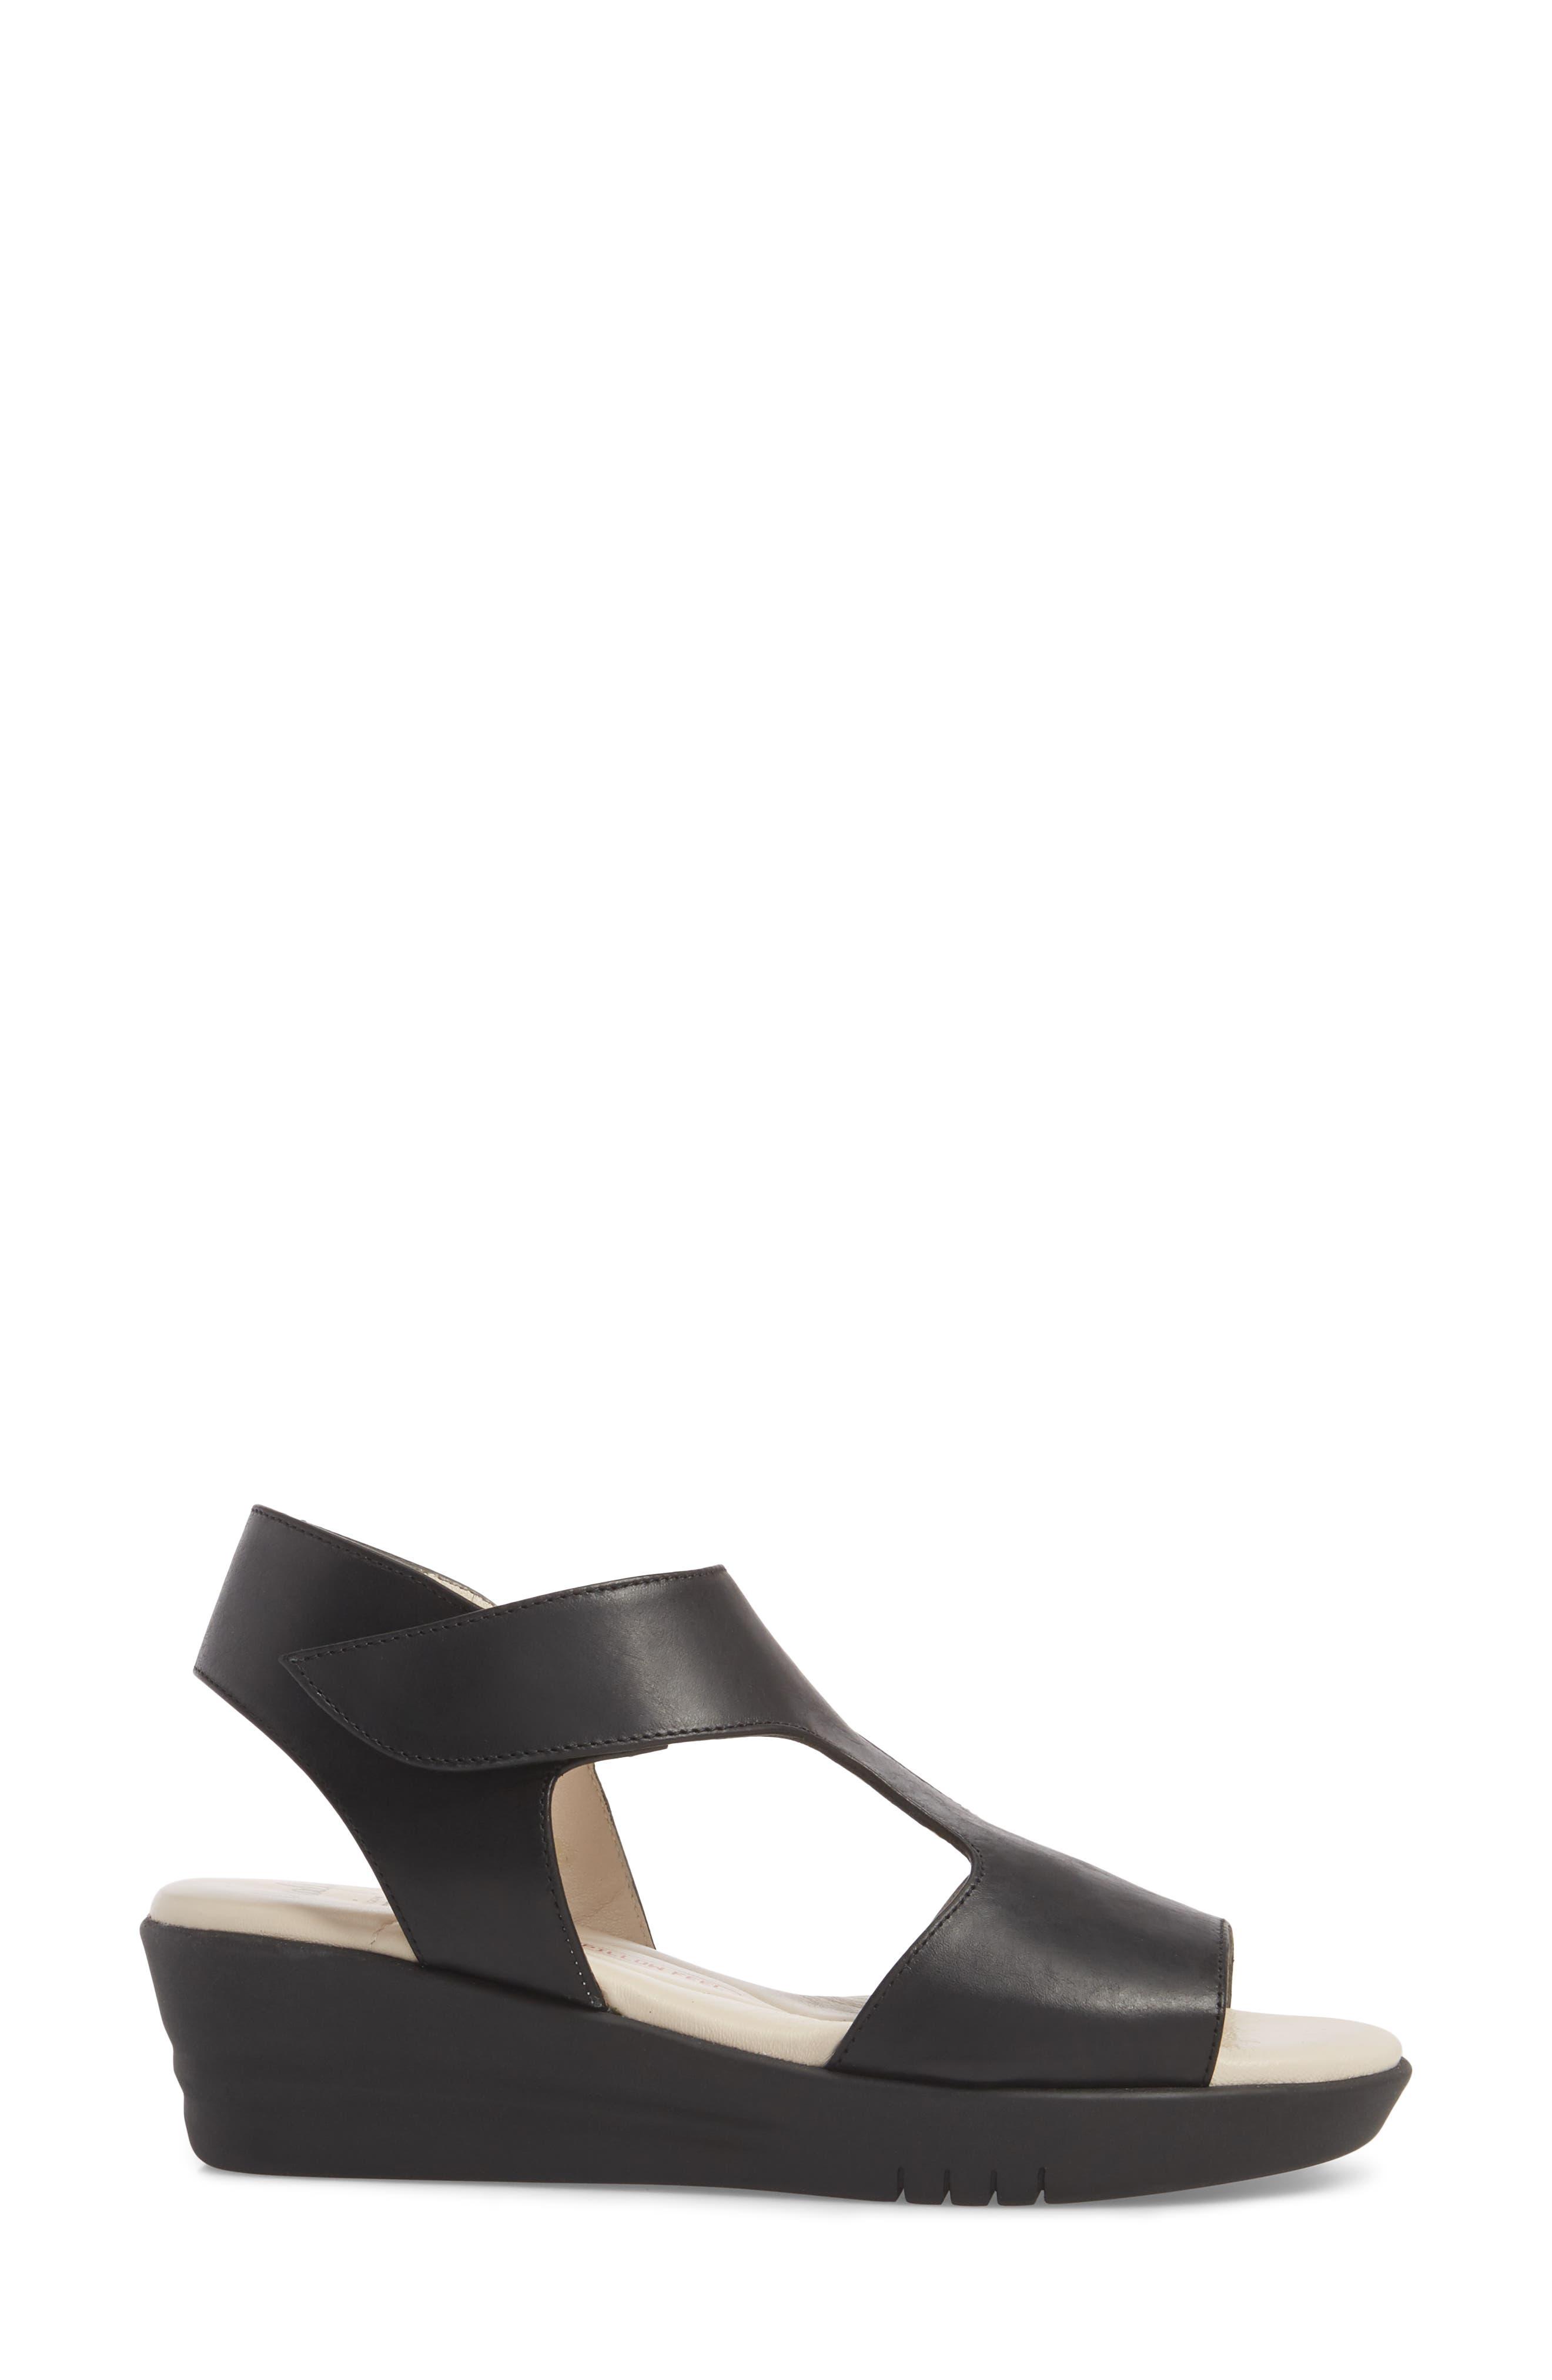 Gabby Platform Sandal,                             Alternate thumbnail 3, color,                             BLACK LEATHER